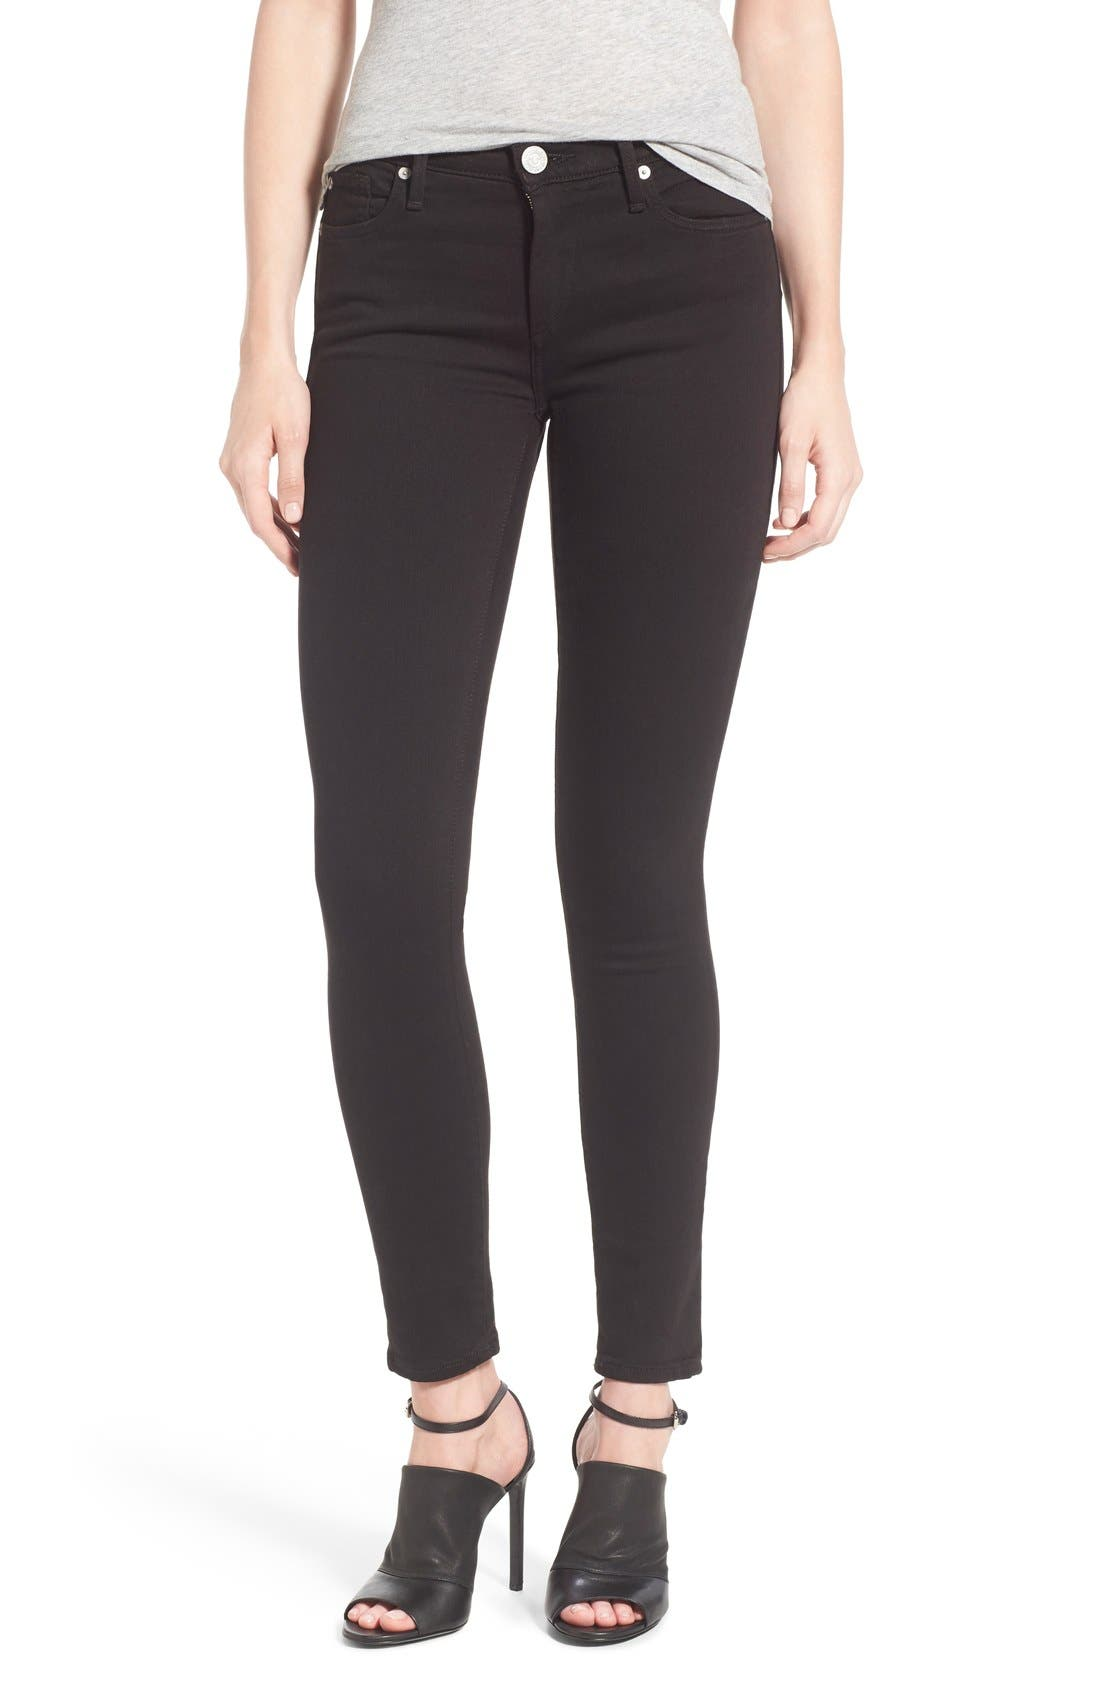 True Religion Brand Jeans 'Halle' Skinny Jeans (Jet Black)